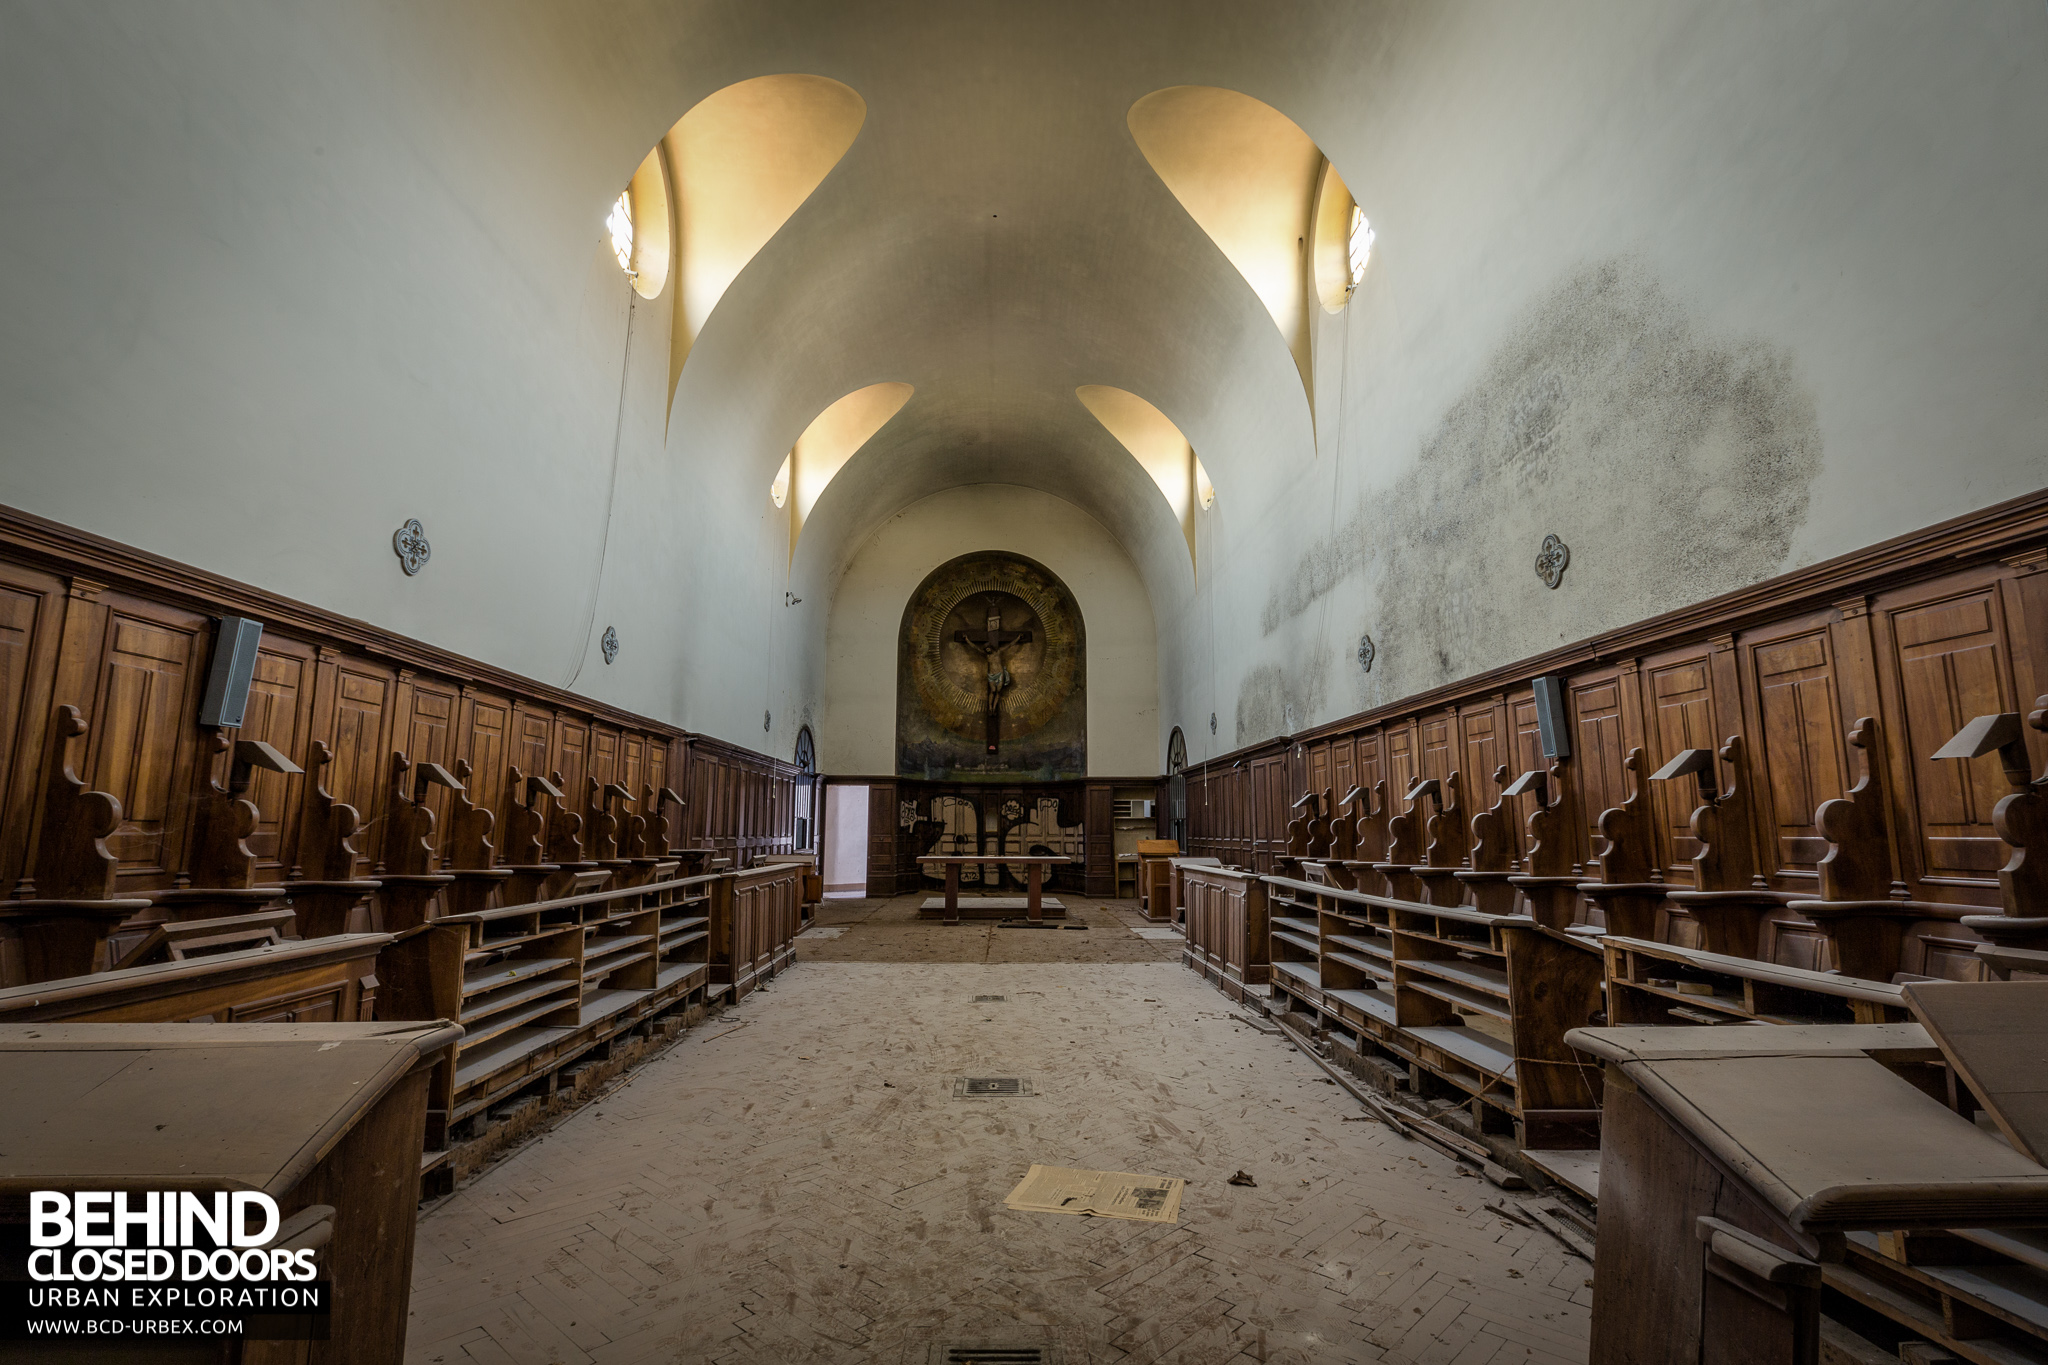 Monastero Mg Abandoned Monastery Italy 187 Urbex Behind